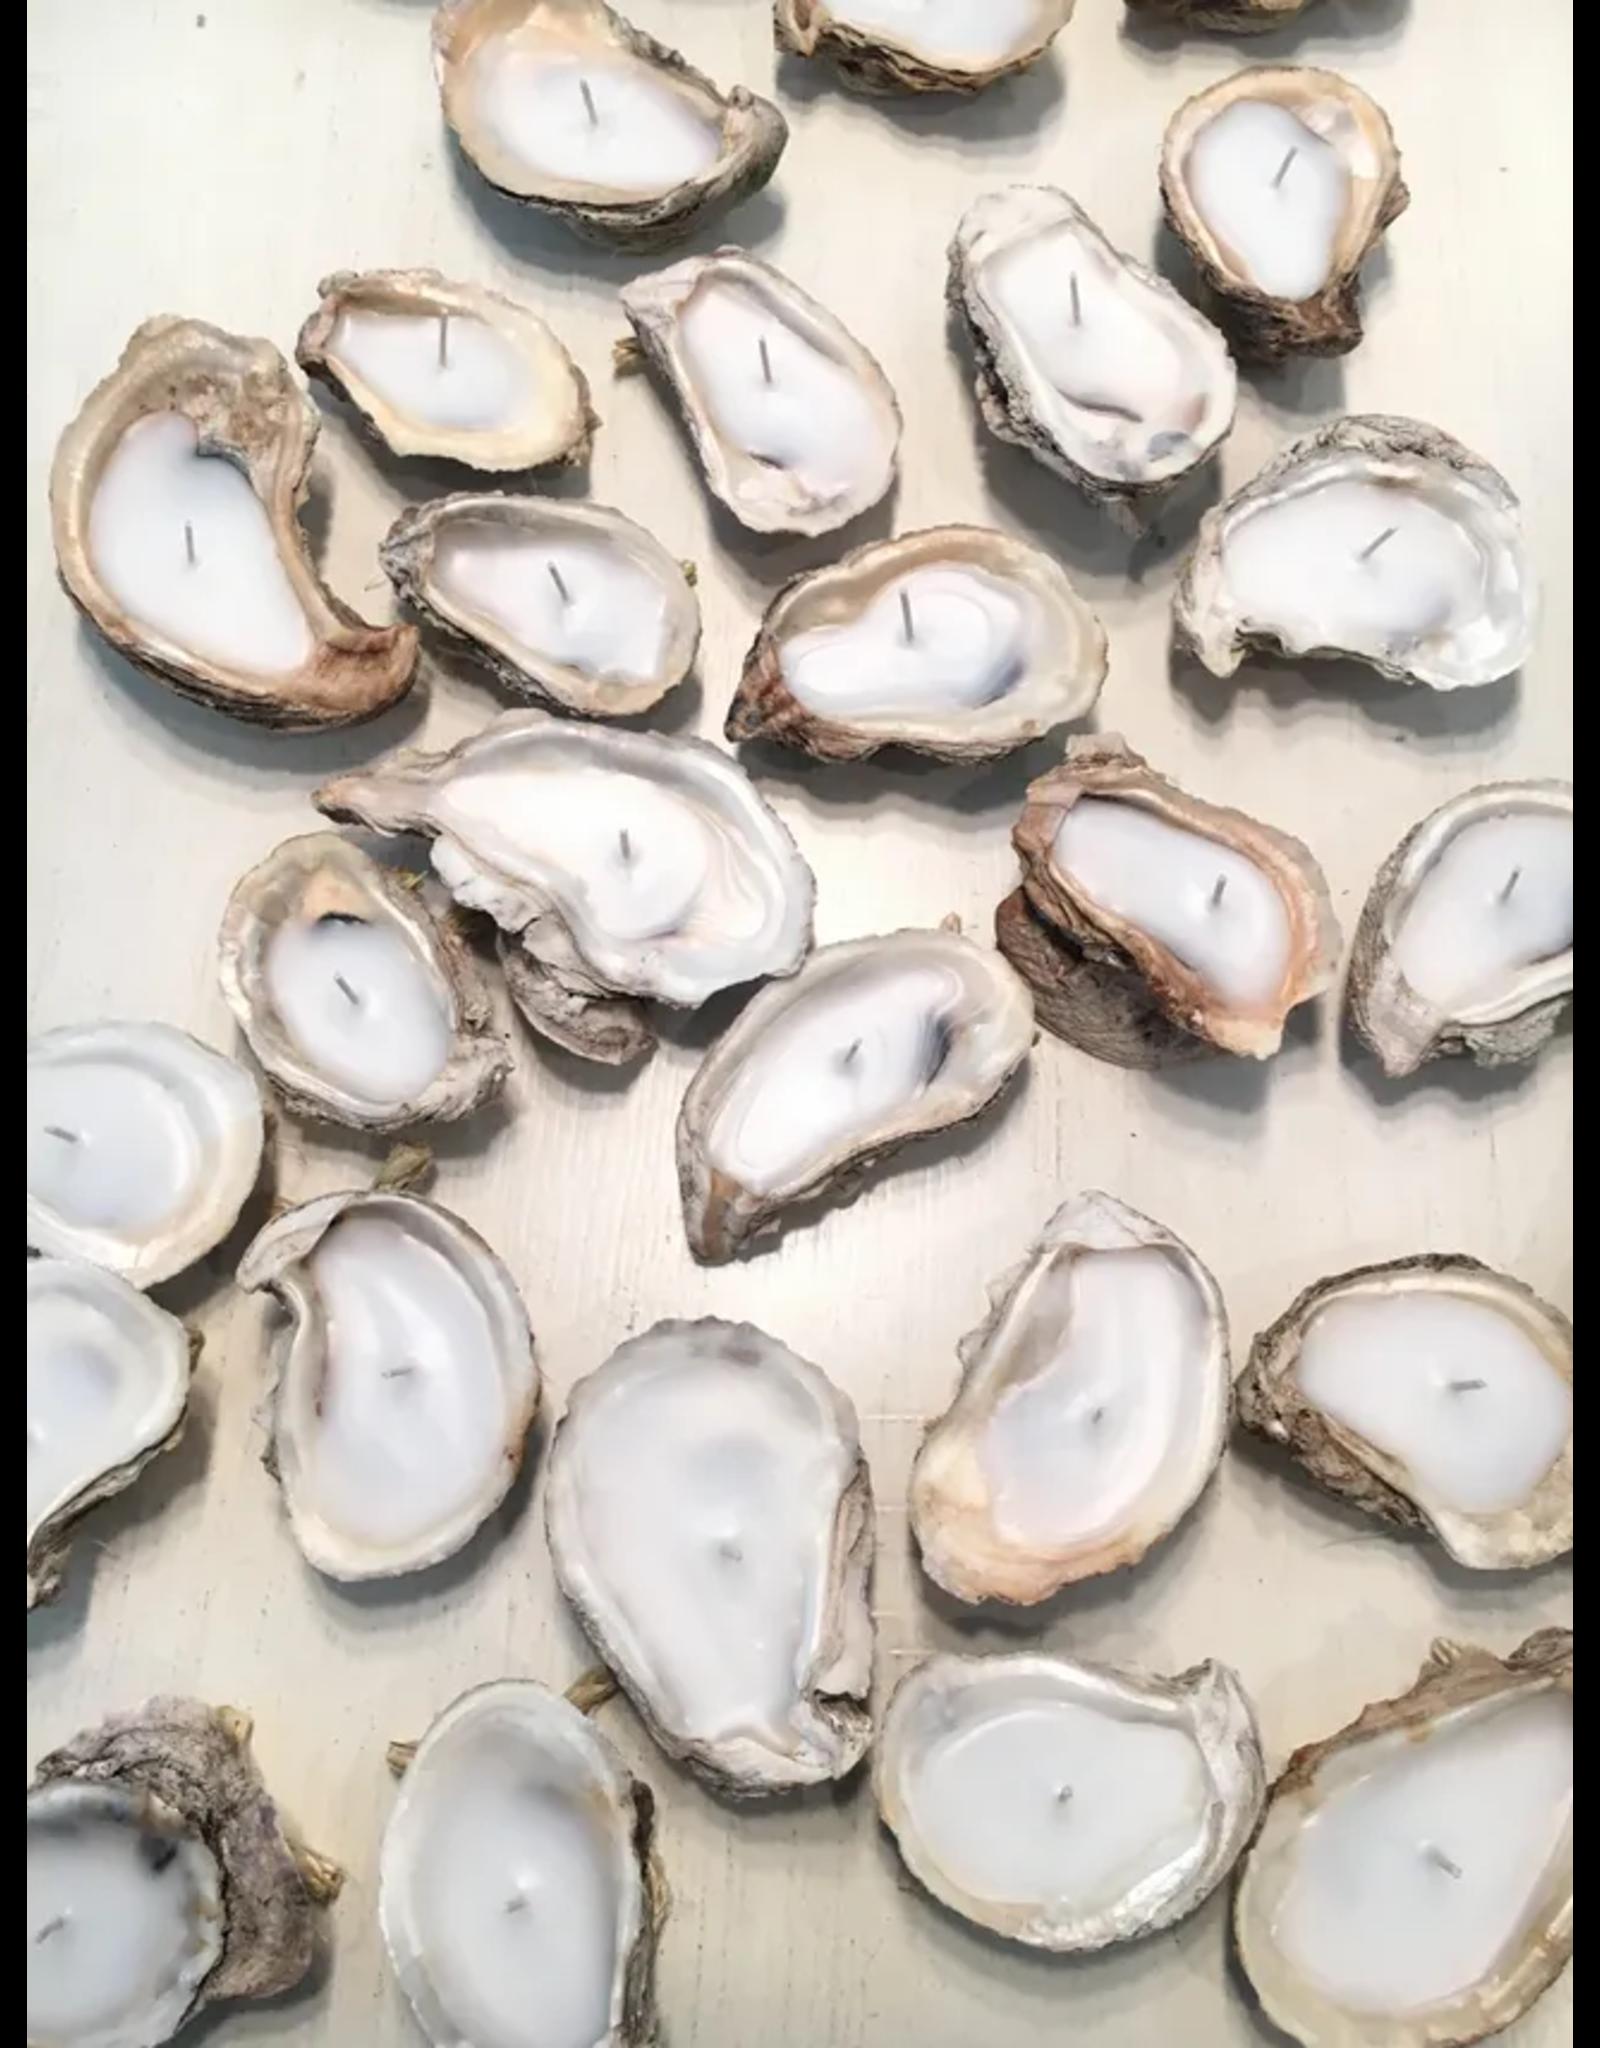 Oak + Arrow Interiors Oyster Gift Set - Sea Salt & Palmetto